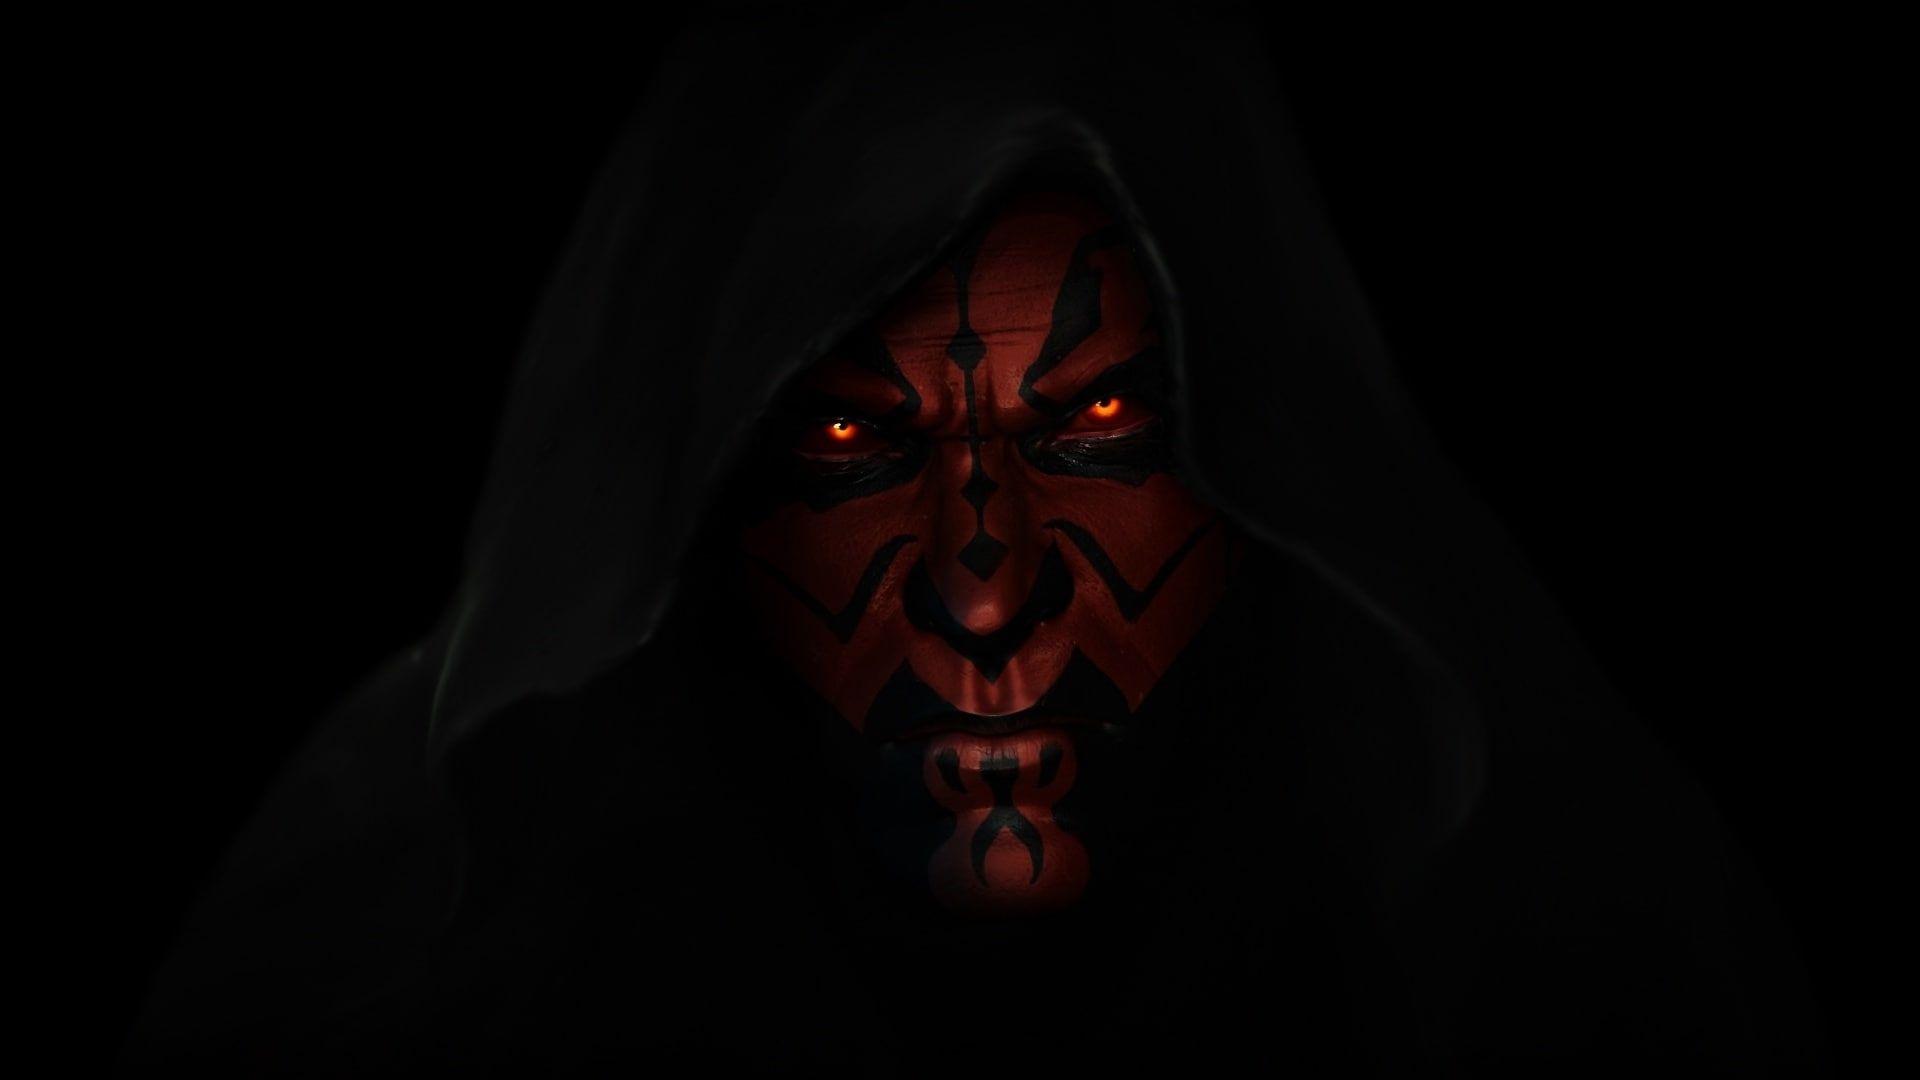 Person Wearing Hood Wallpaper Star Wars Darth Maul A Sith Lord Wallpaper Hood Wallpapers Darth Maul Wallpaper Darth Maul